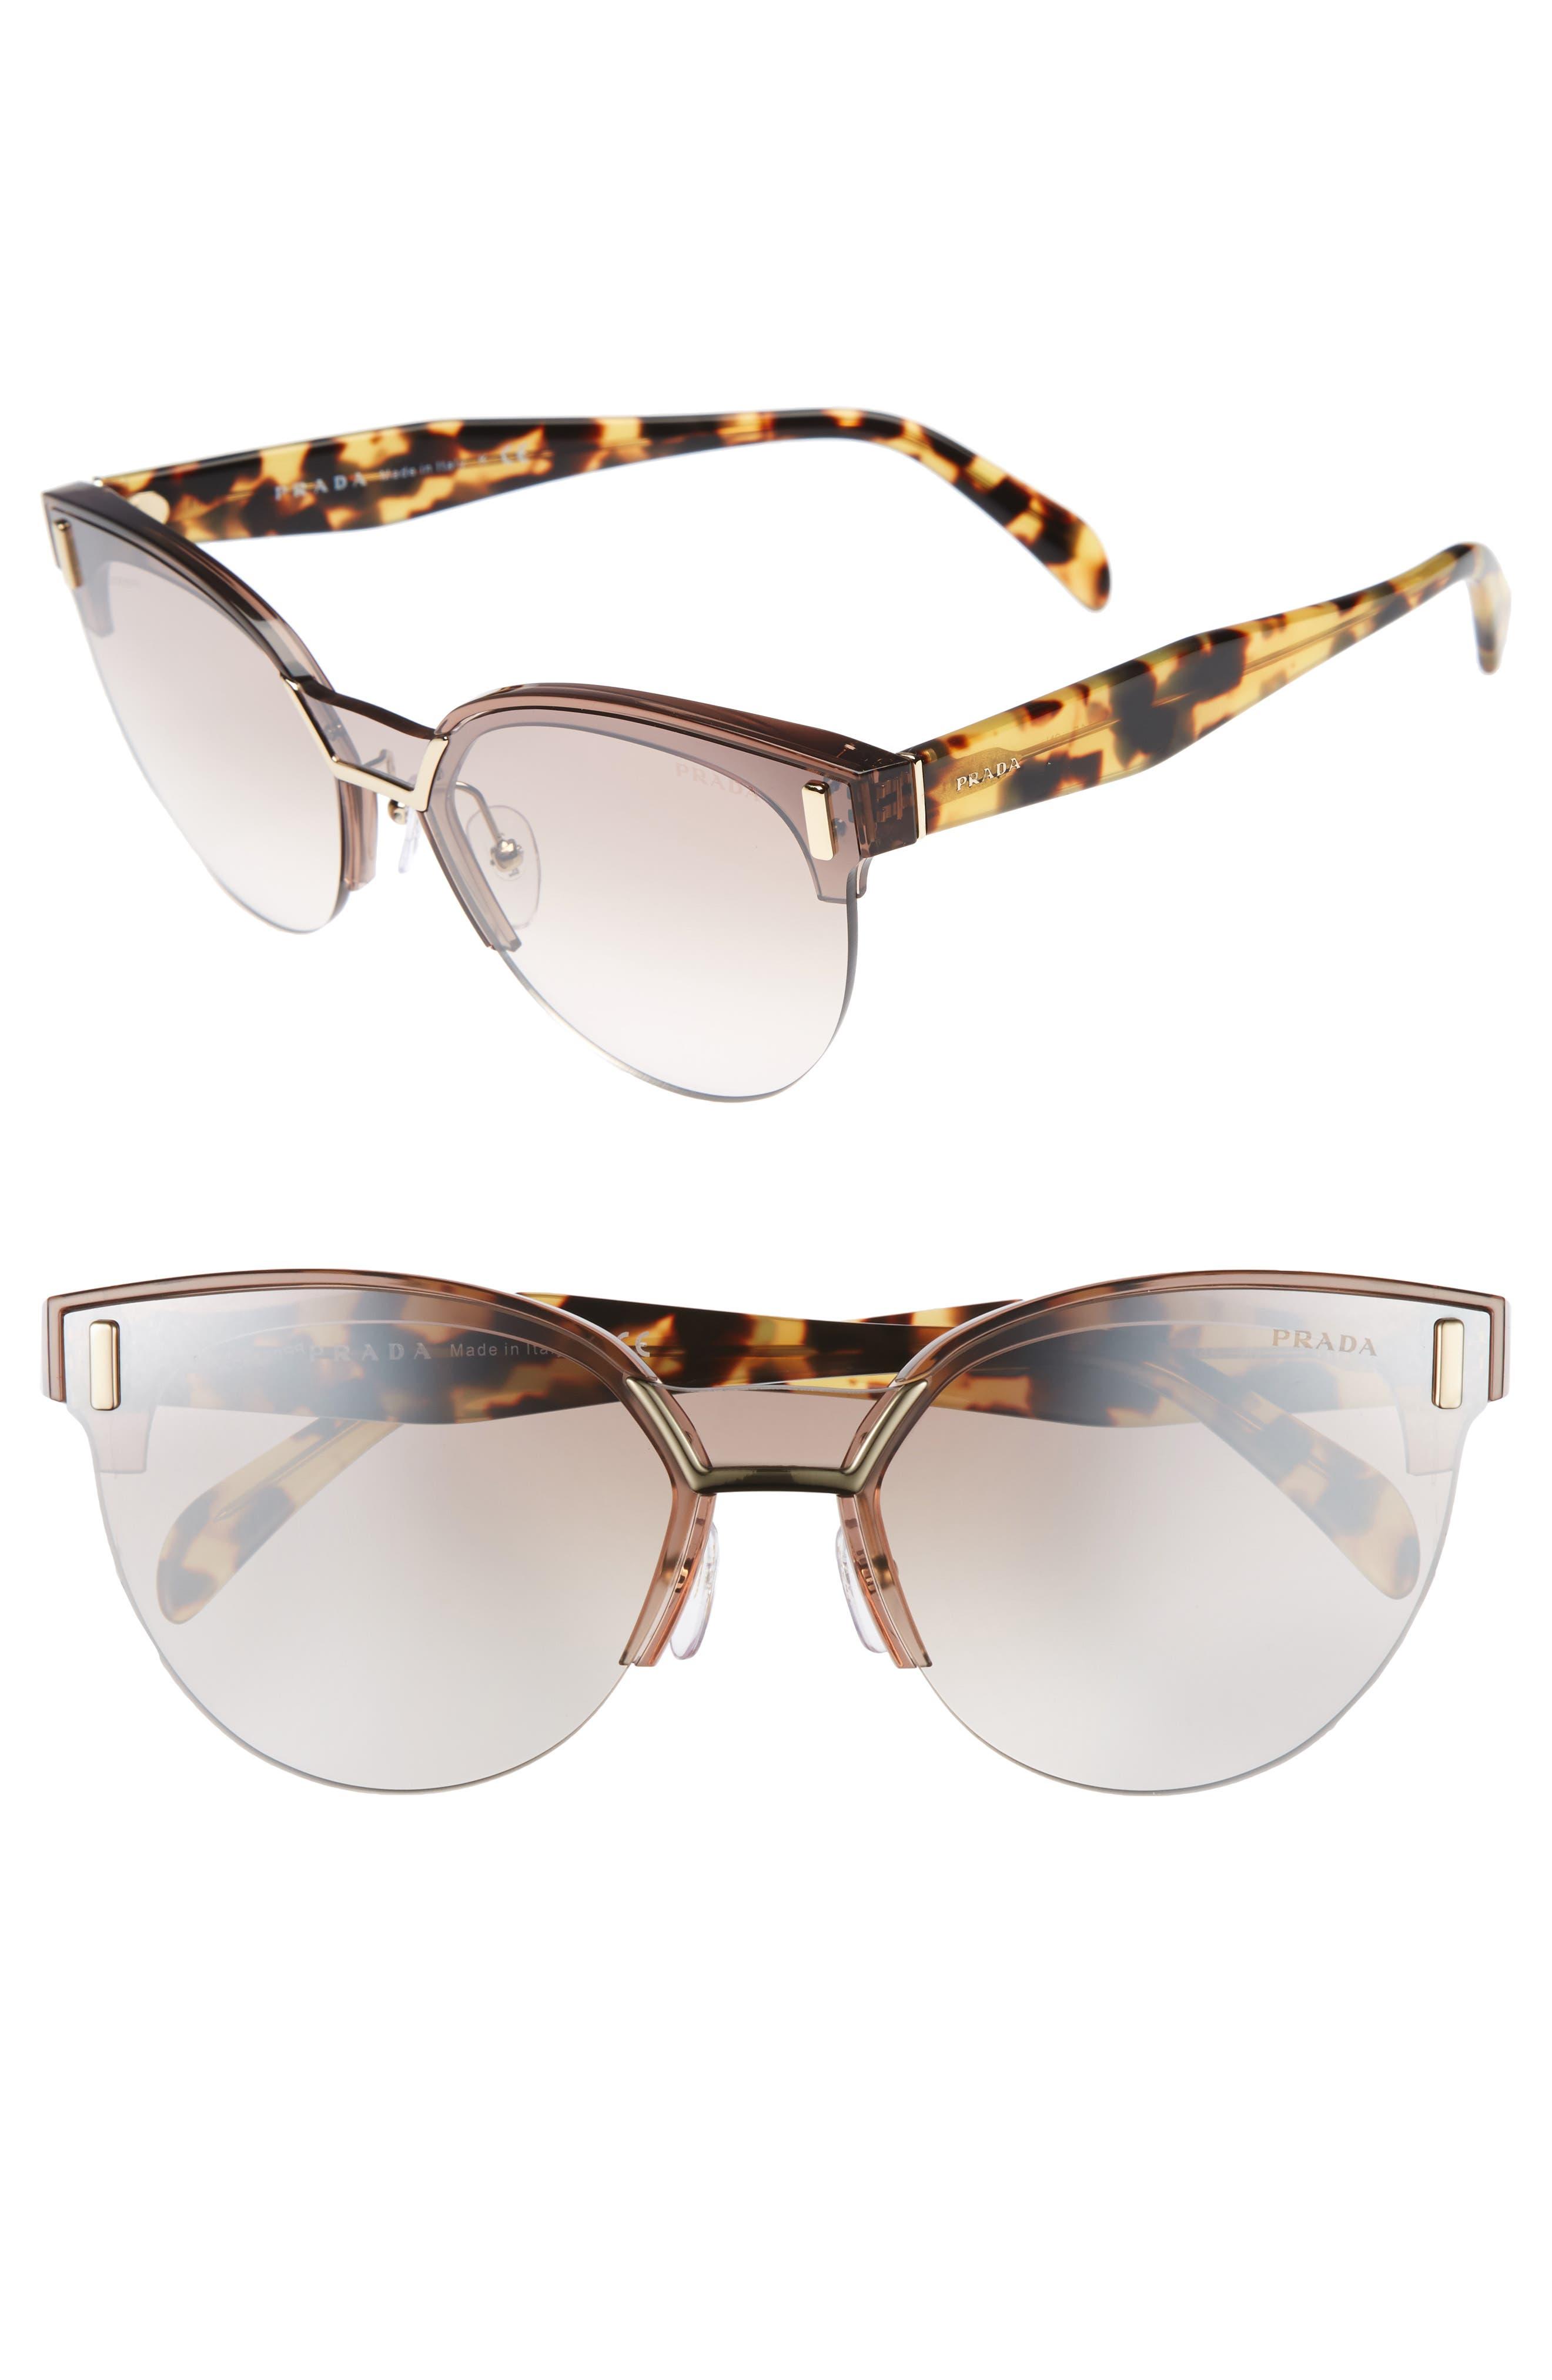 43mm Semi Rimless Sunglasses,                         Main,                         color, TRANSPARENT BROWN